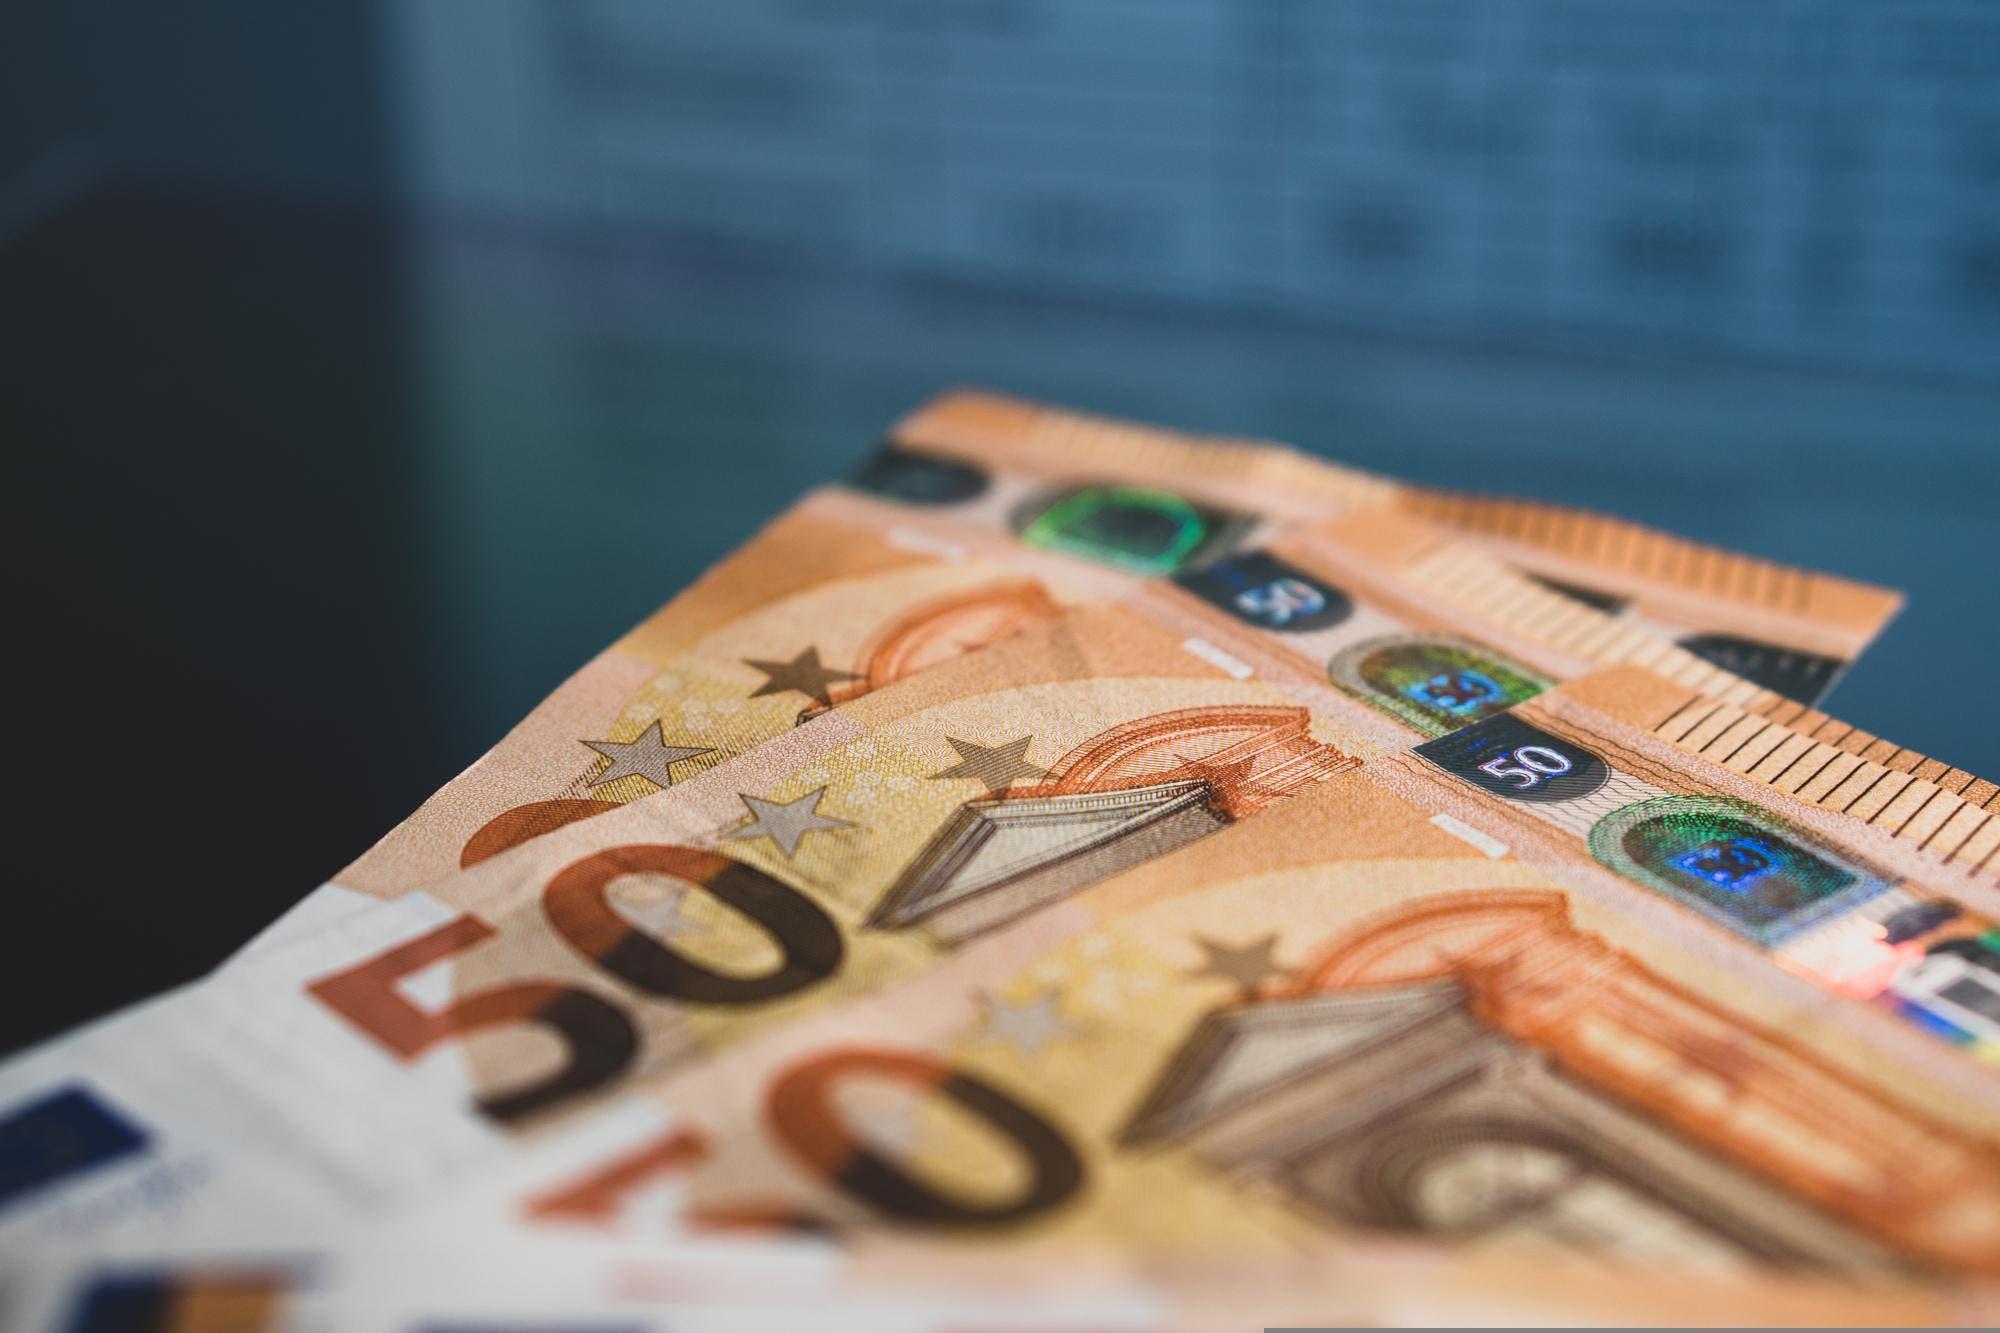 Euro hoy en Argentina: a cuánto cotiza hoy martes 27 de octubre